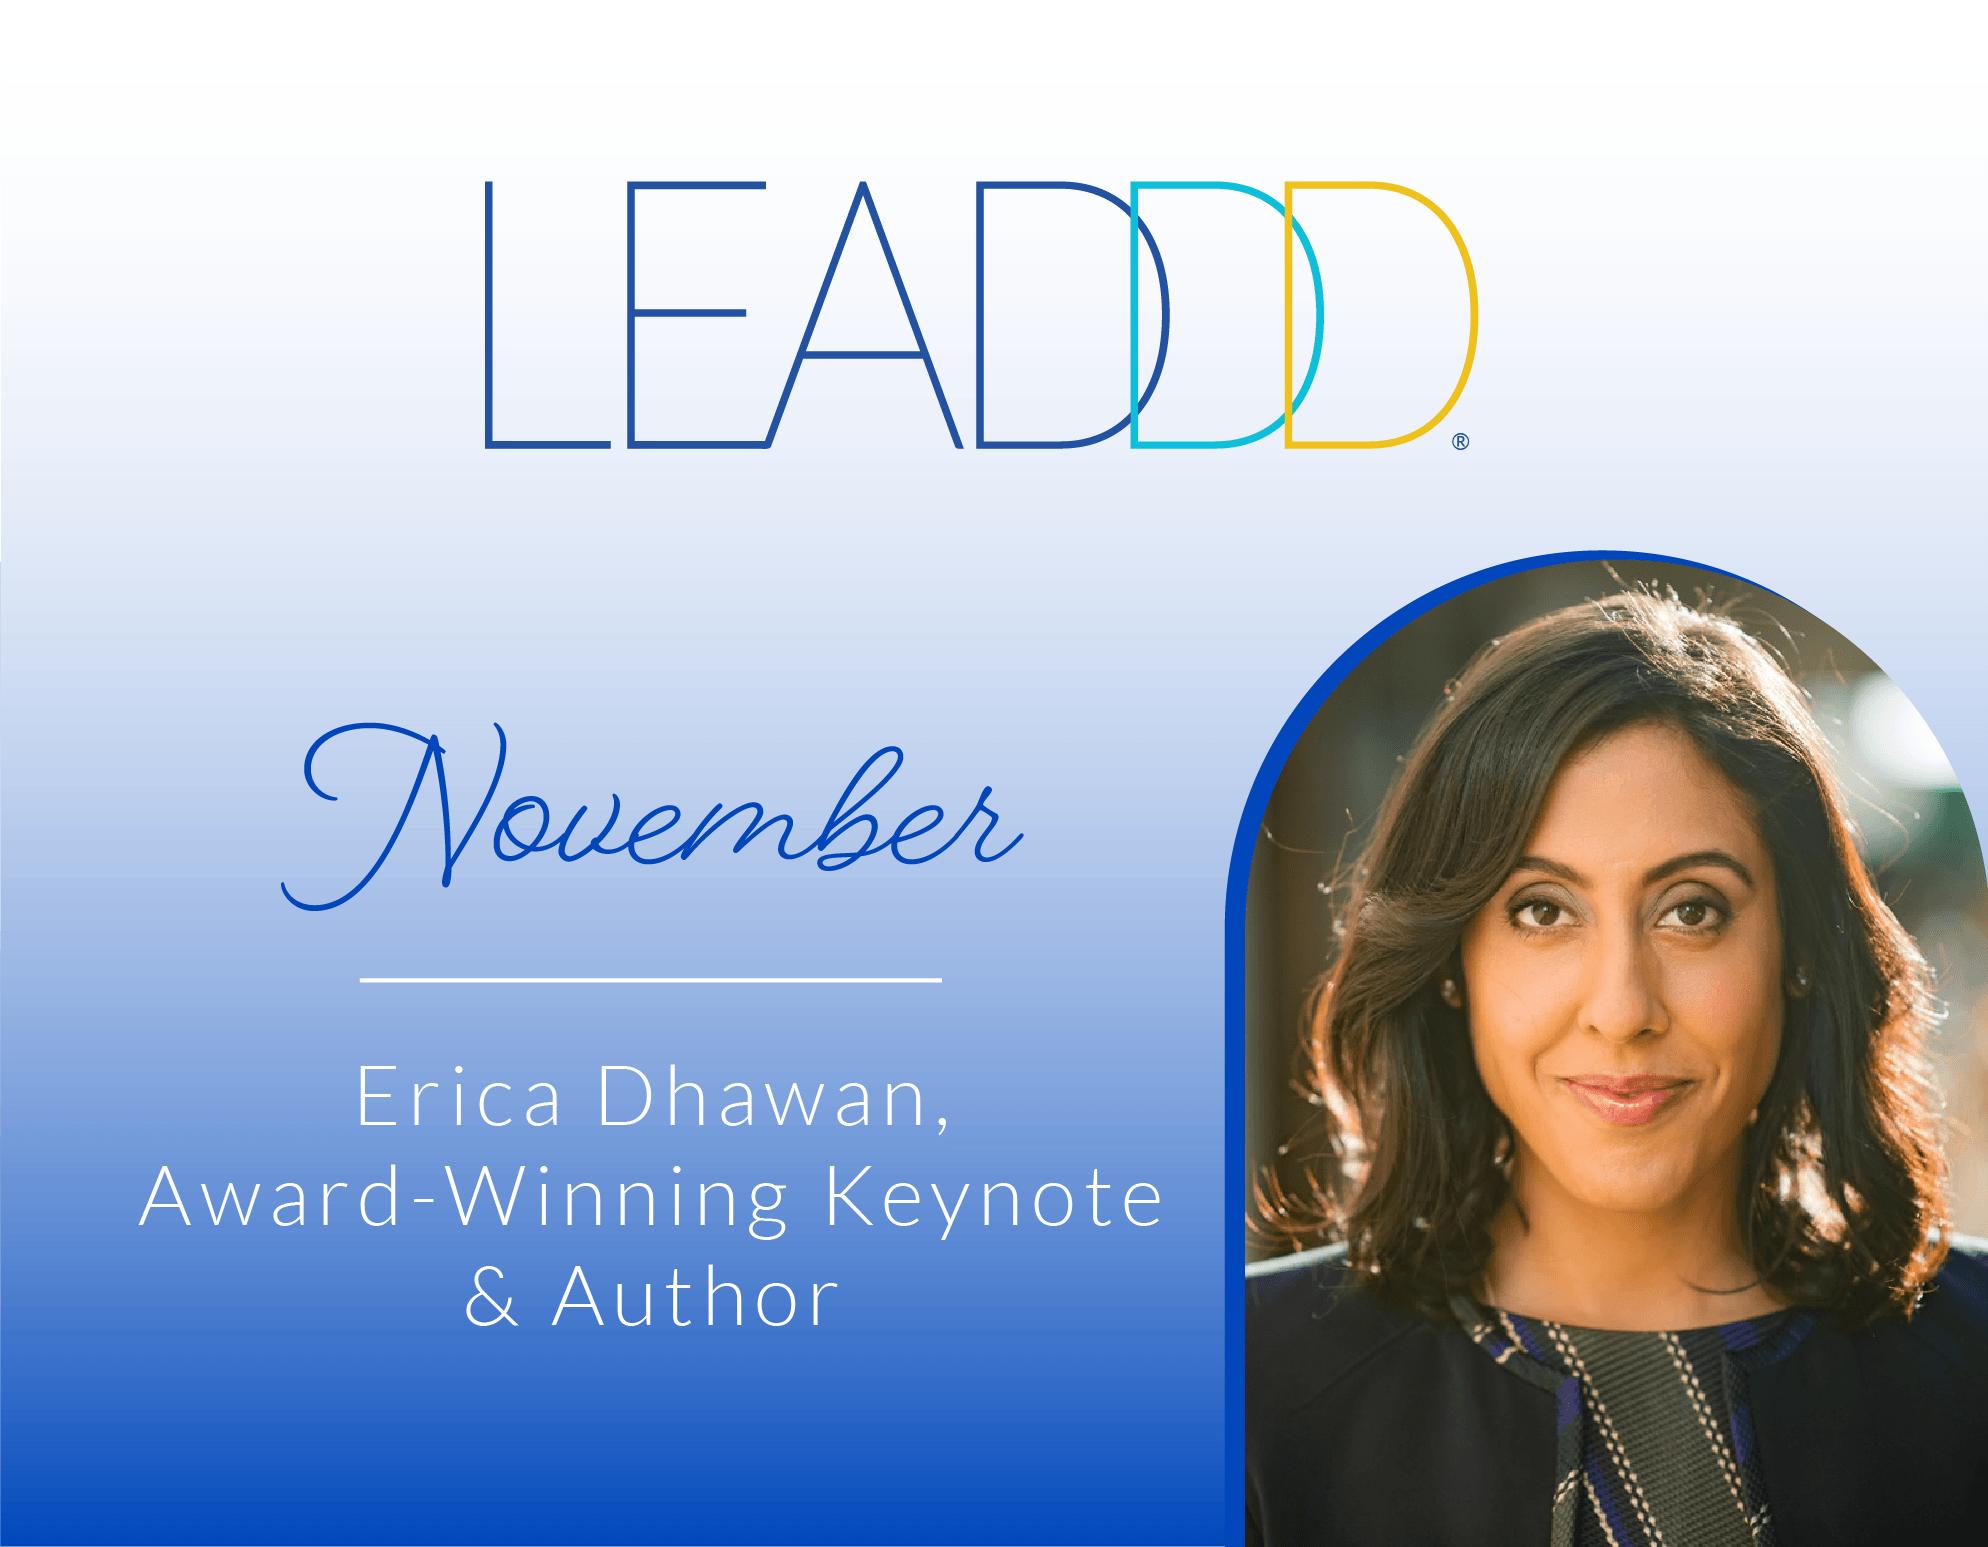 LEADDD Keynote Series: November